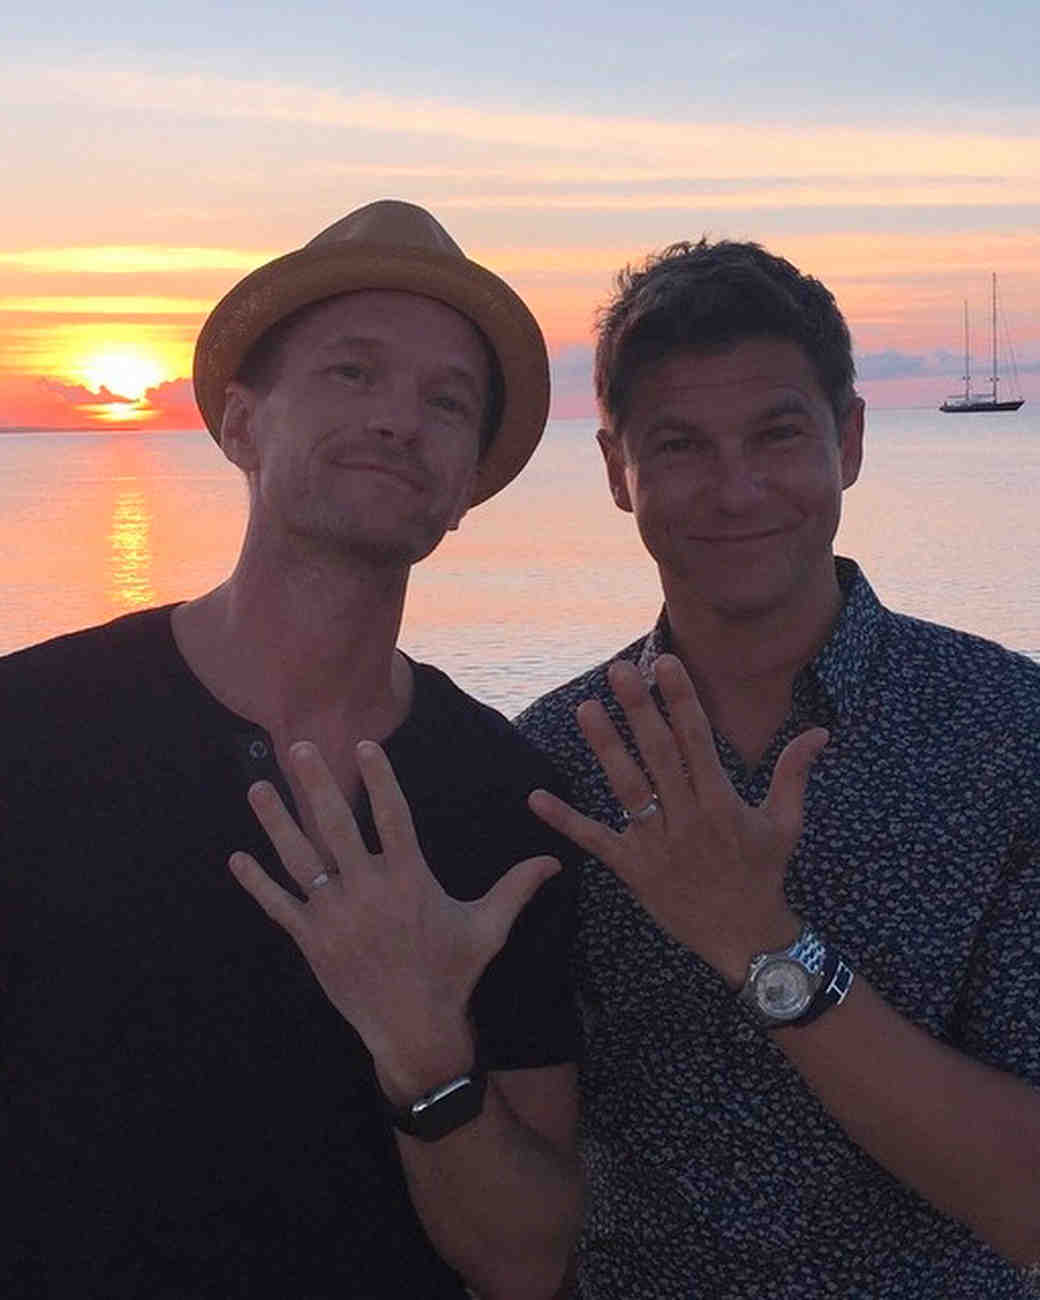 Neil Patrick Harris and David Burtka wedding bands